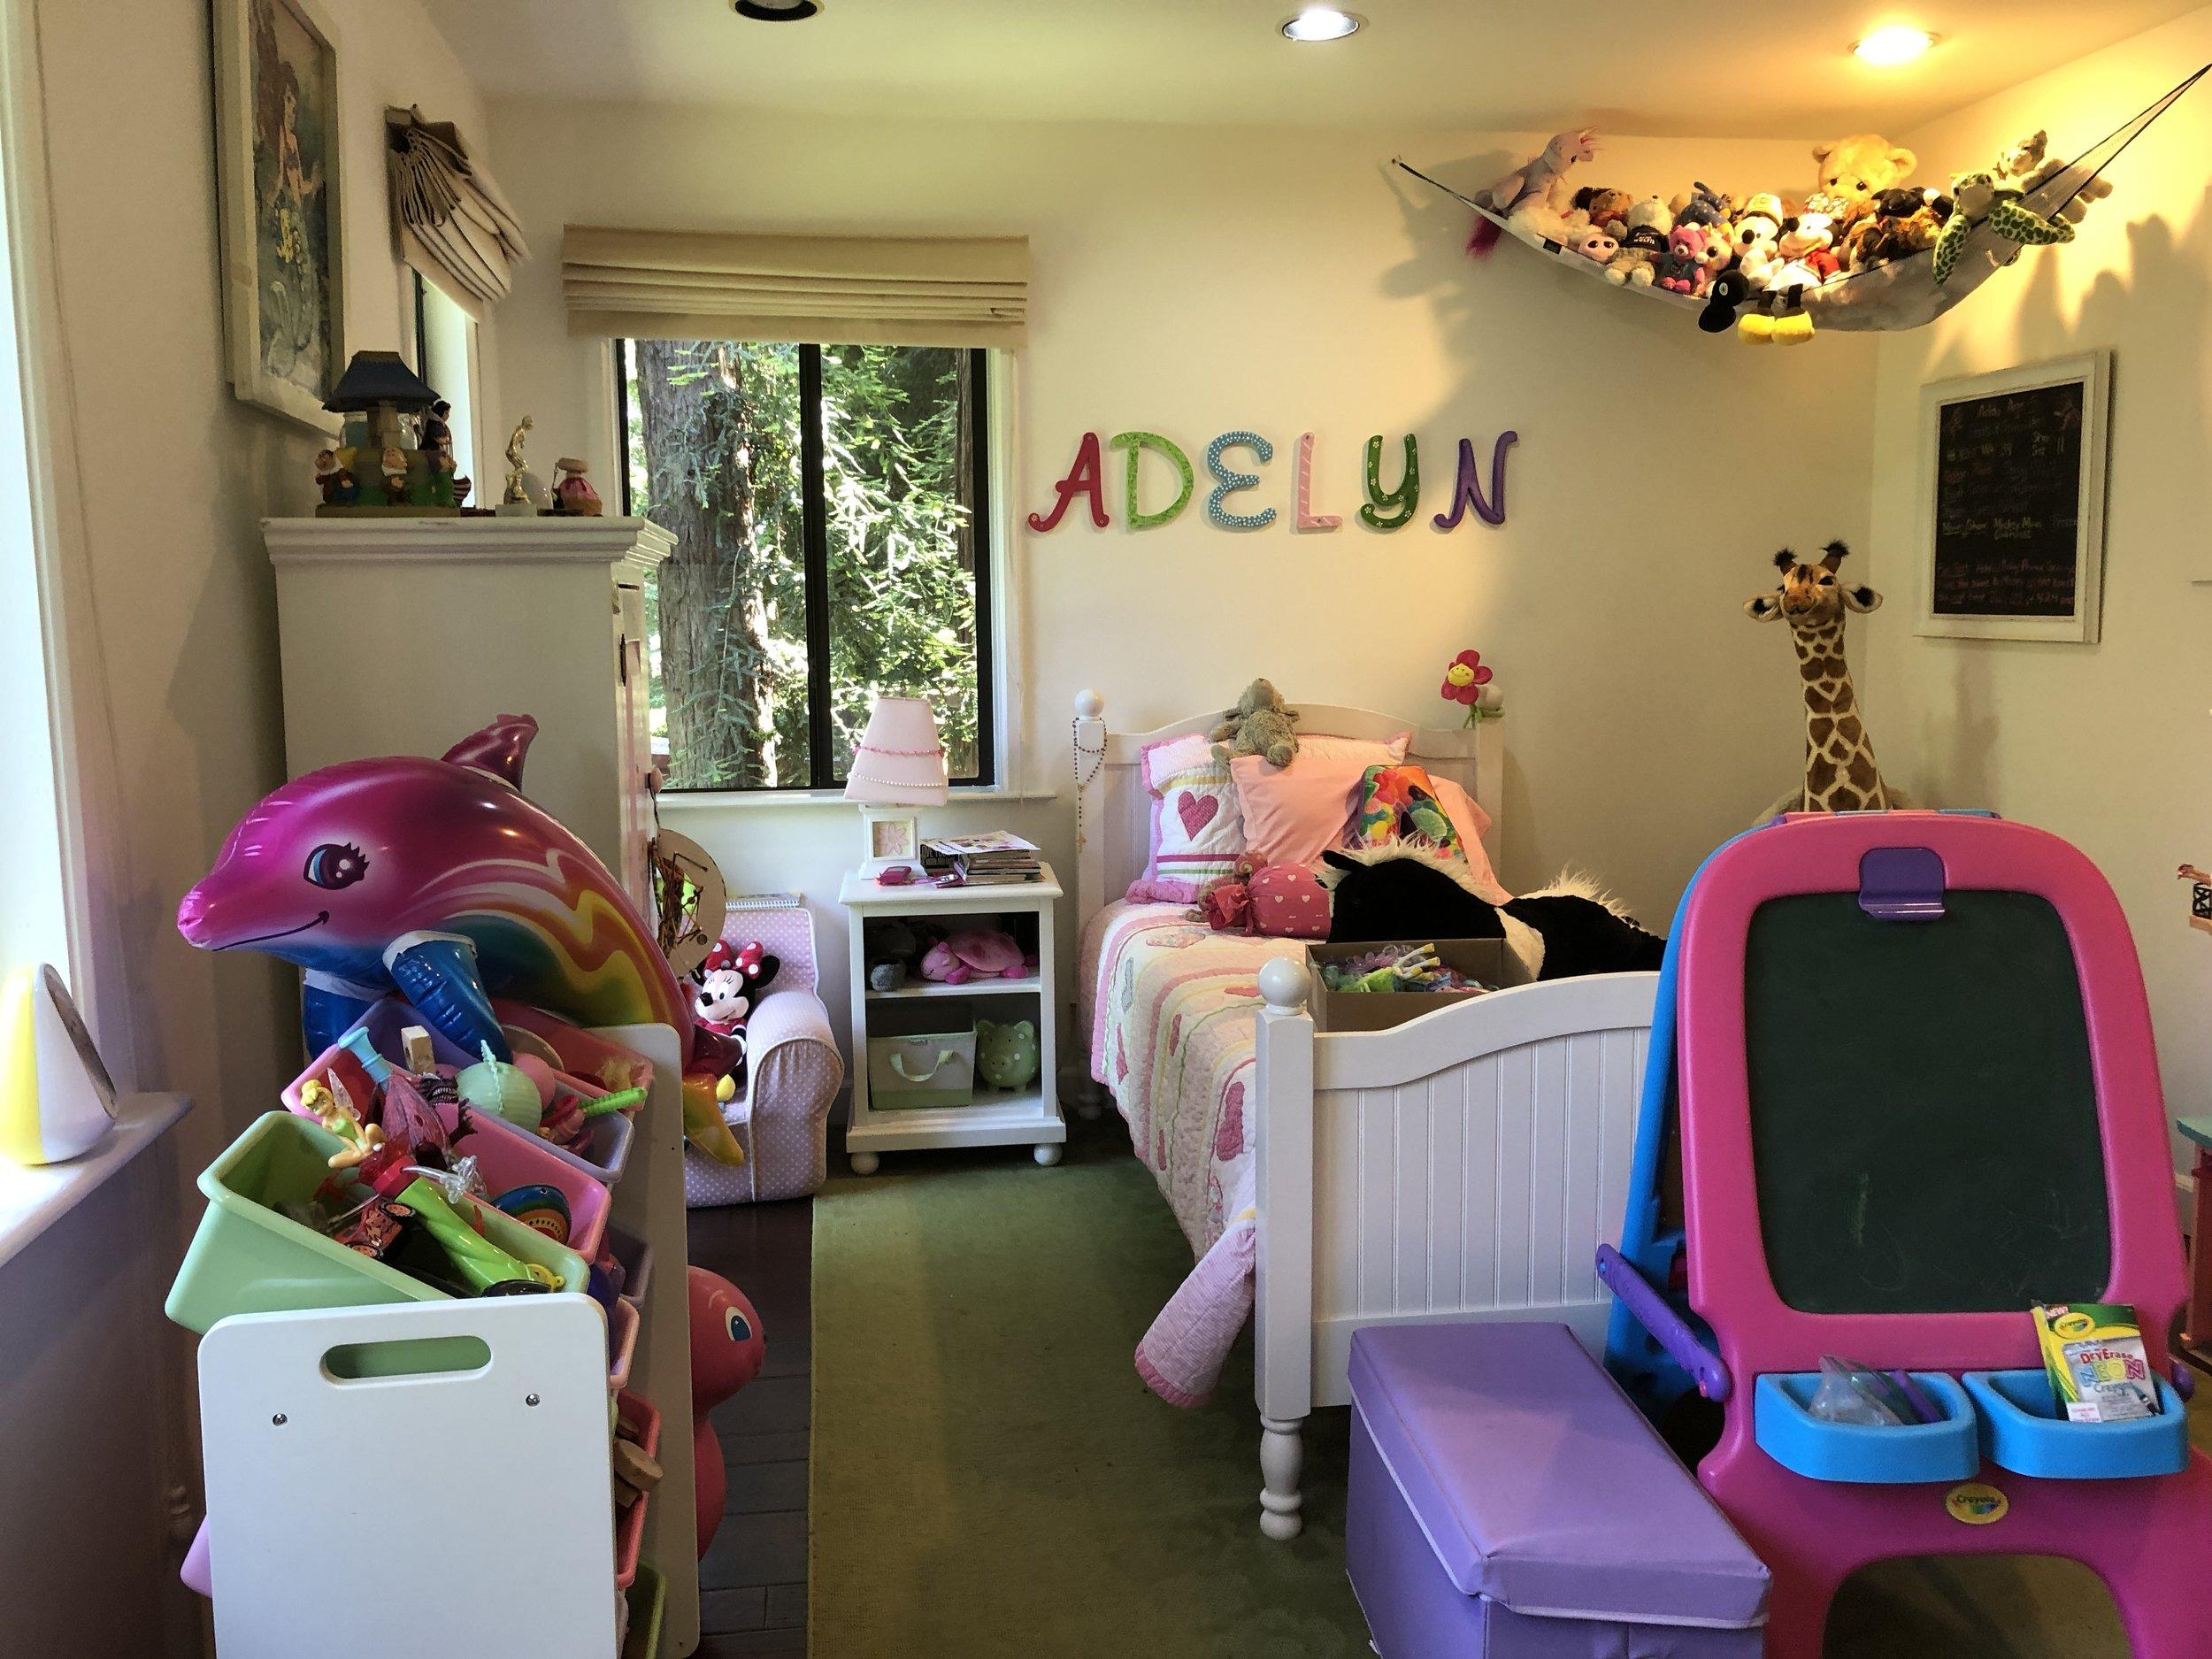 3 beverly kids room before.JPG